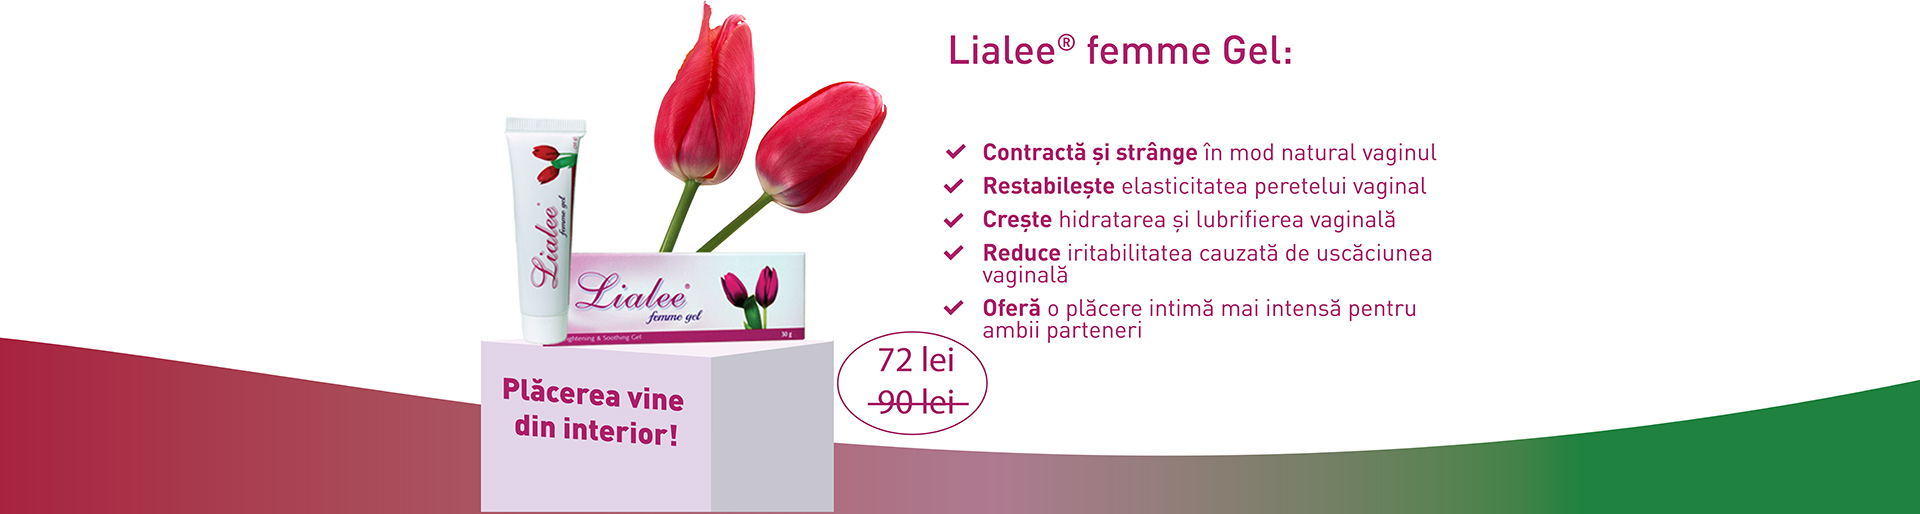 Promotie Lialee femme Gel